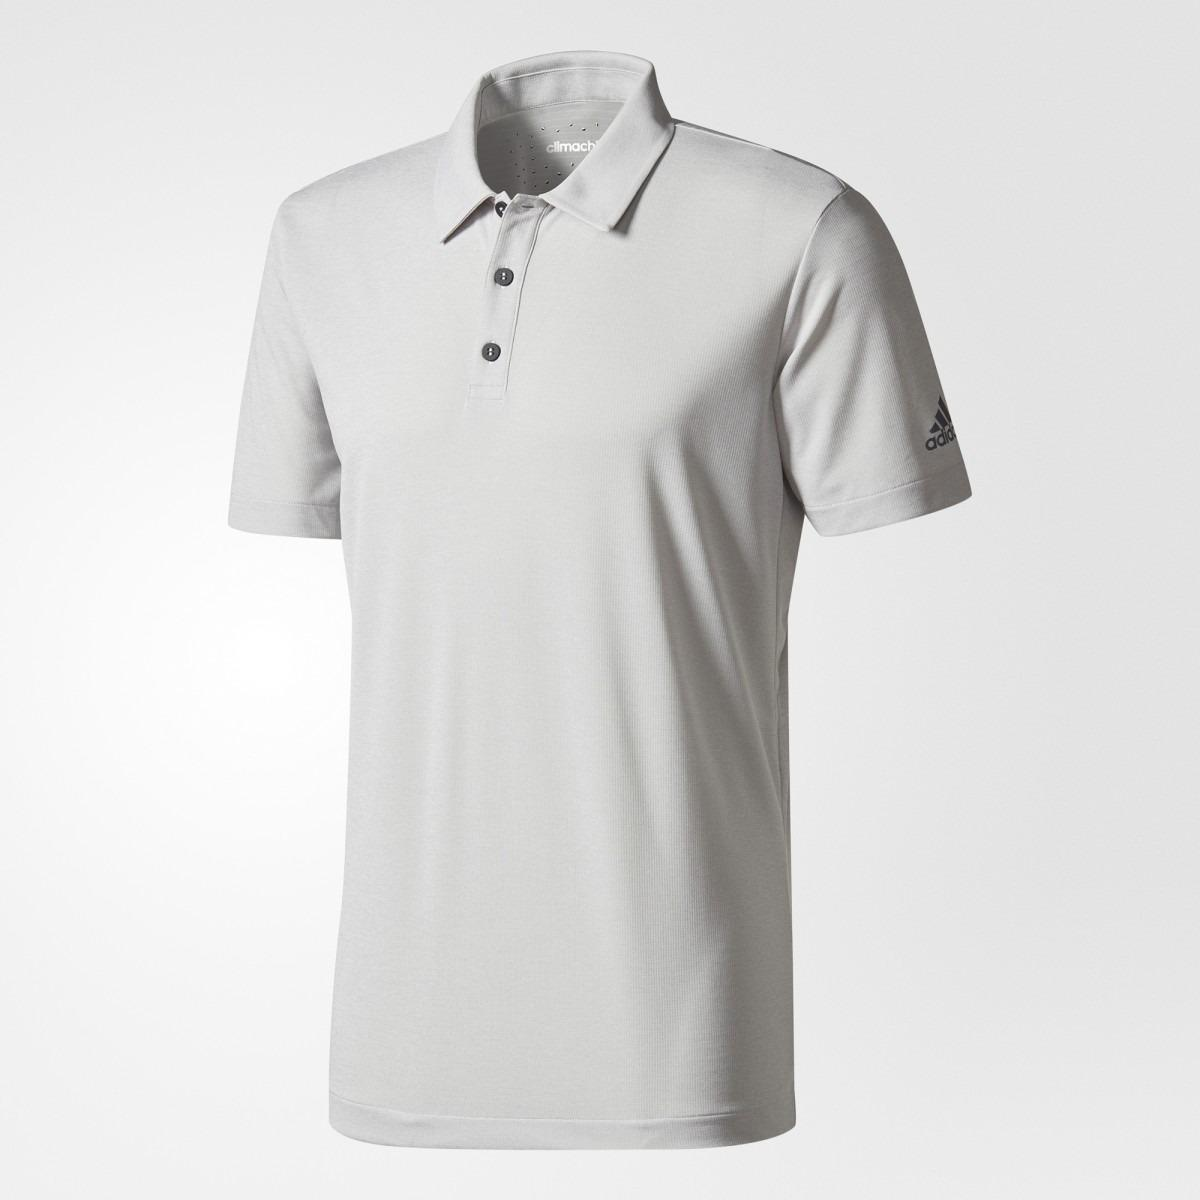 Adidas Kaos Polo Uncontroll Climachill Polo shirt - CD0704